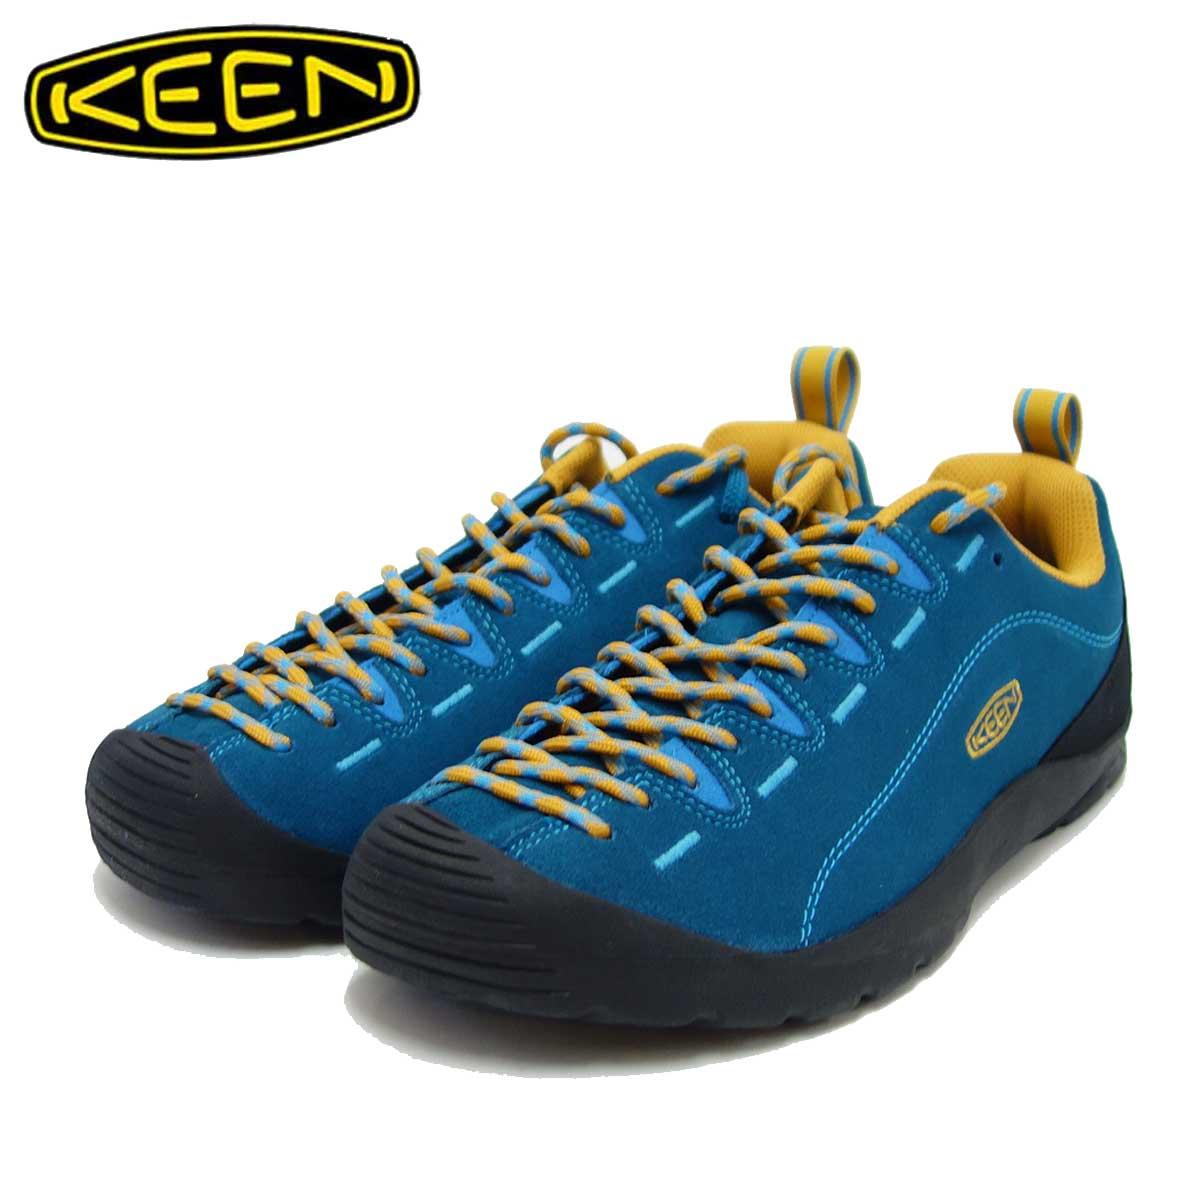 KEEN キーン JASPER ジャスパー 1020330(レディース)カラー:Corsair / Sunflower 「靴」